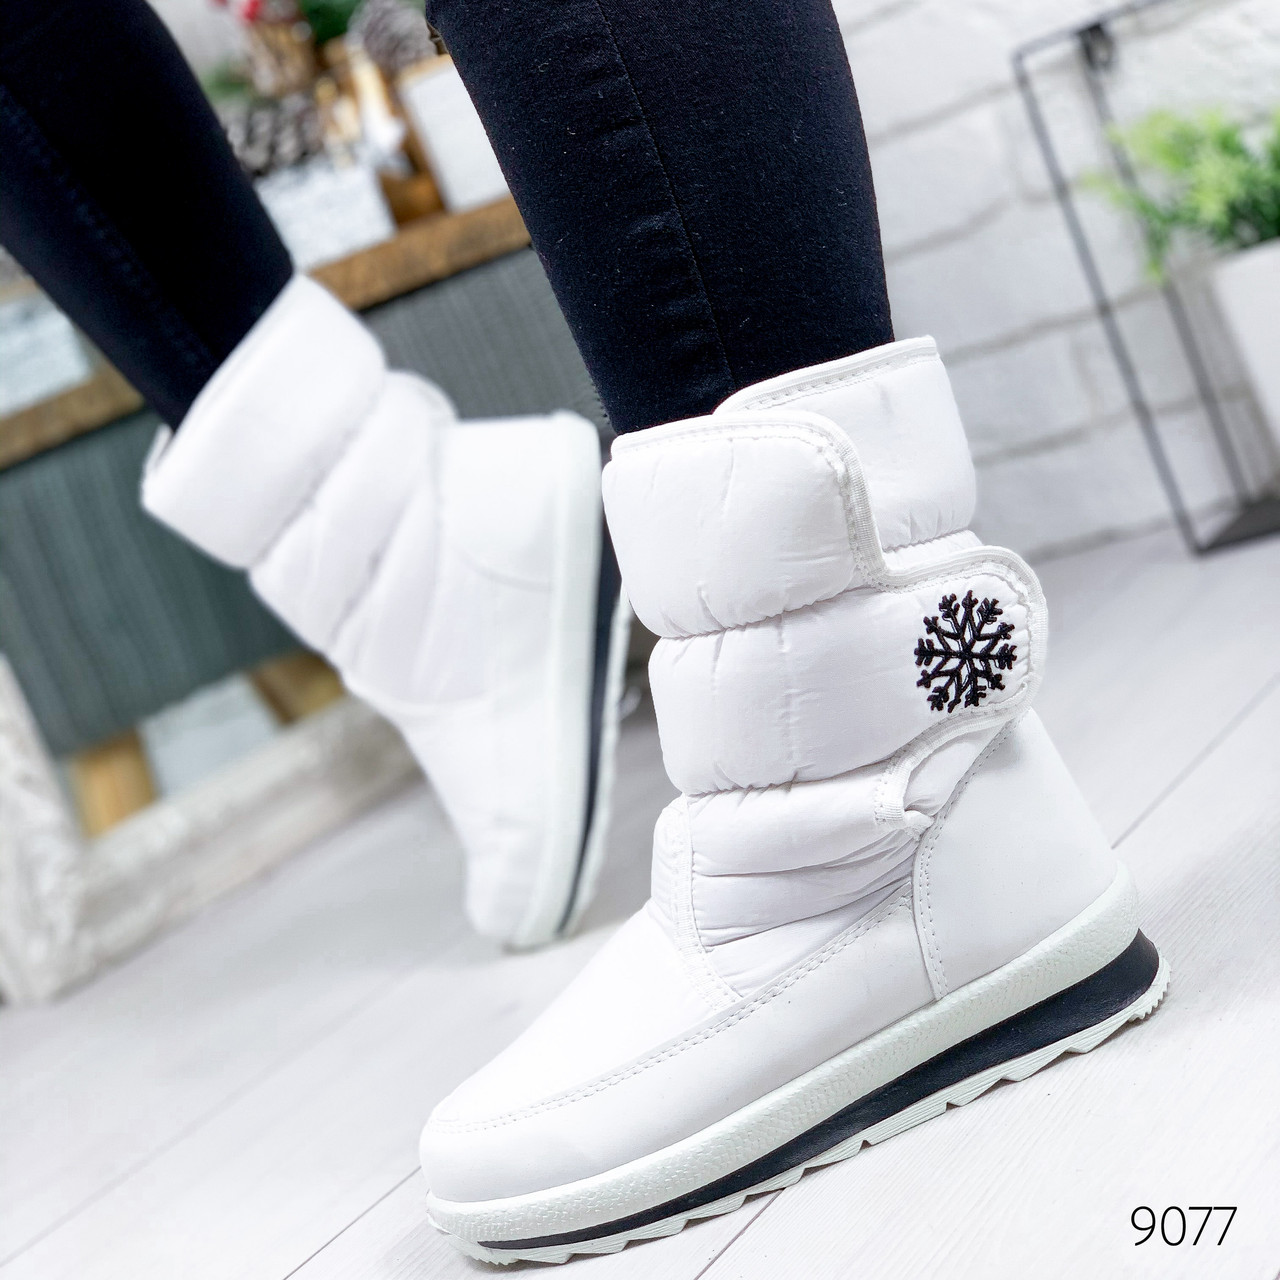 Сапоги дутики женские Снежинка G белые 9077